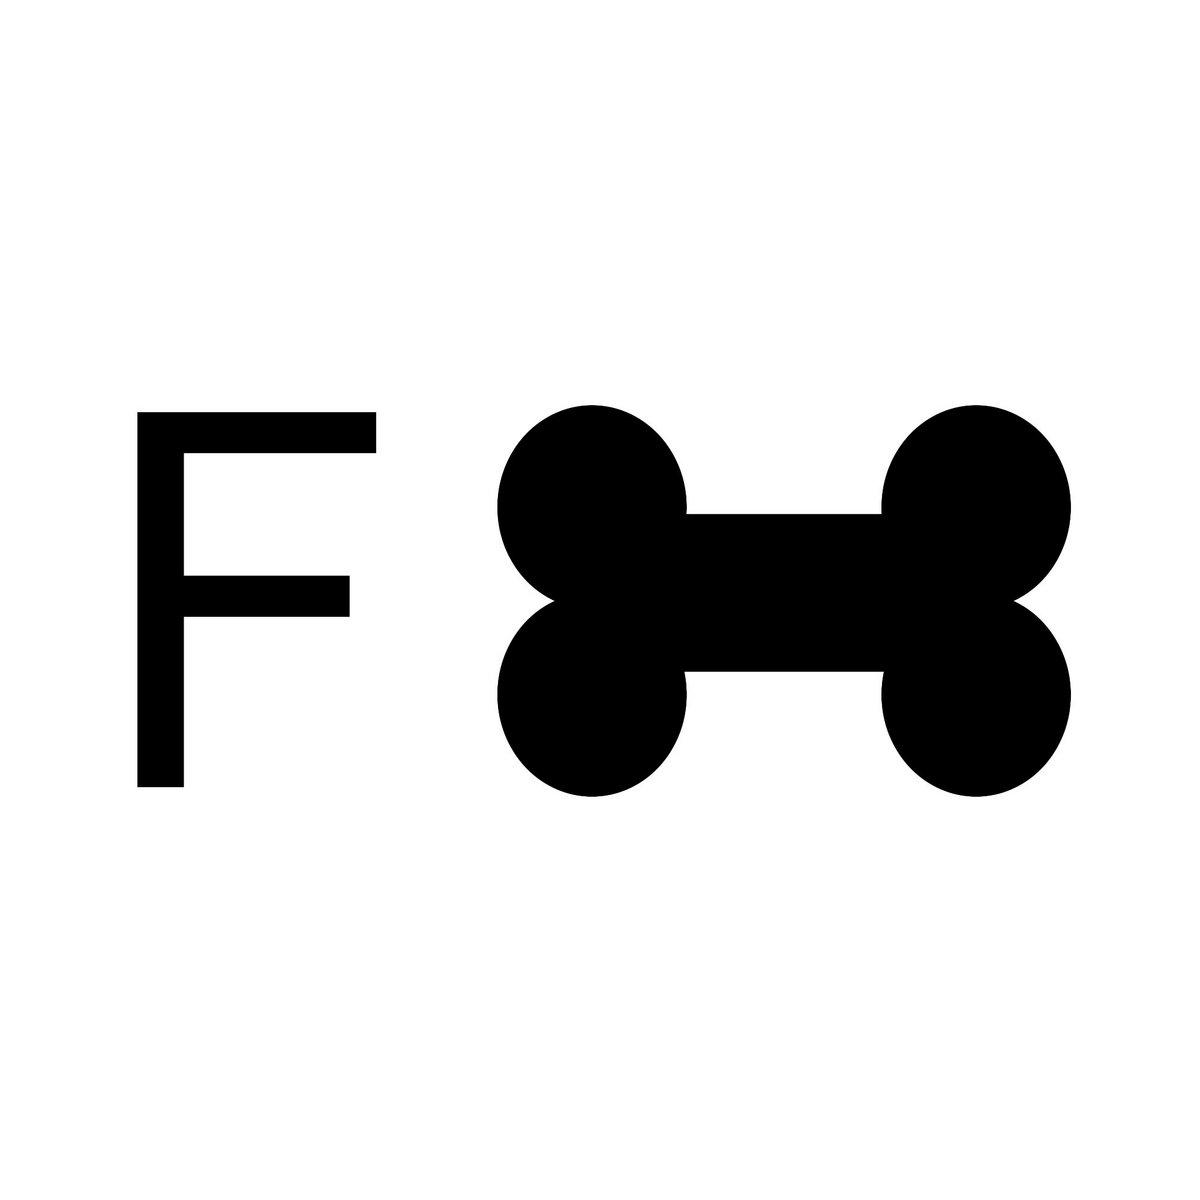 Music Femur Records